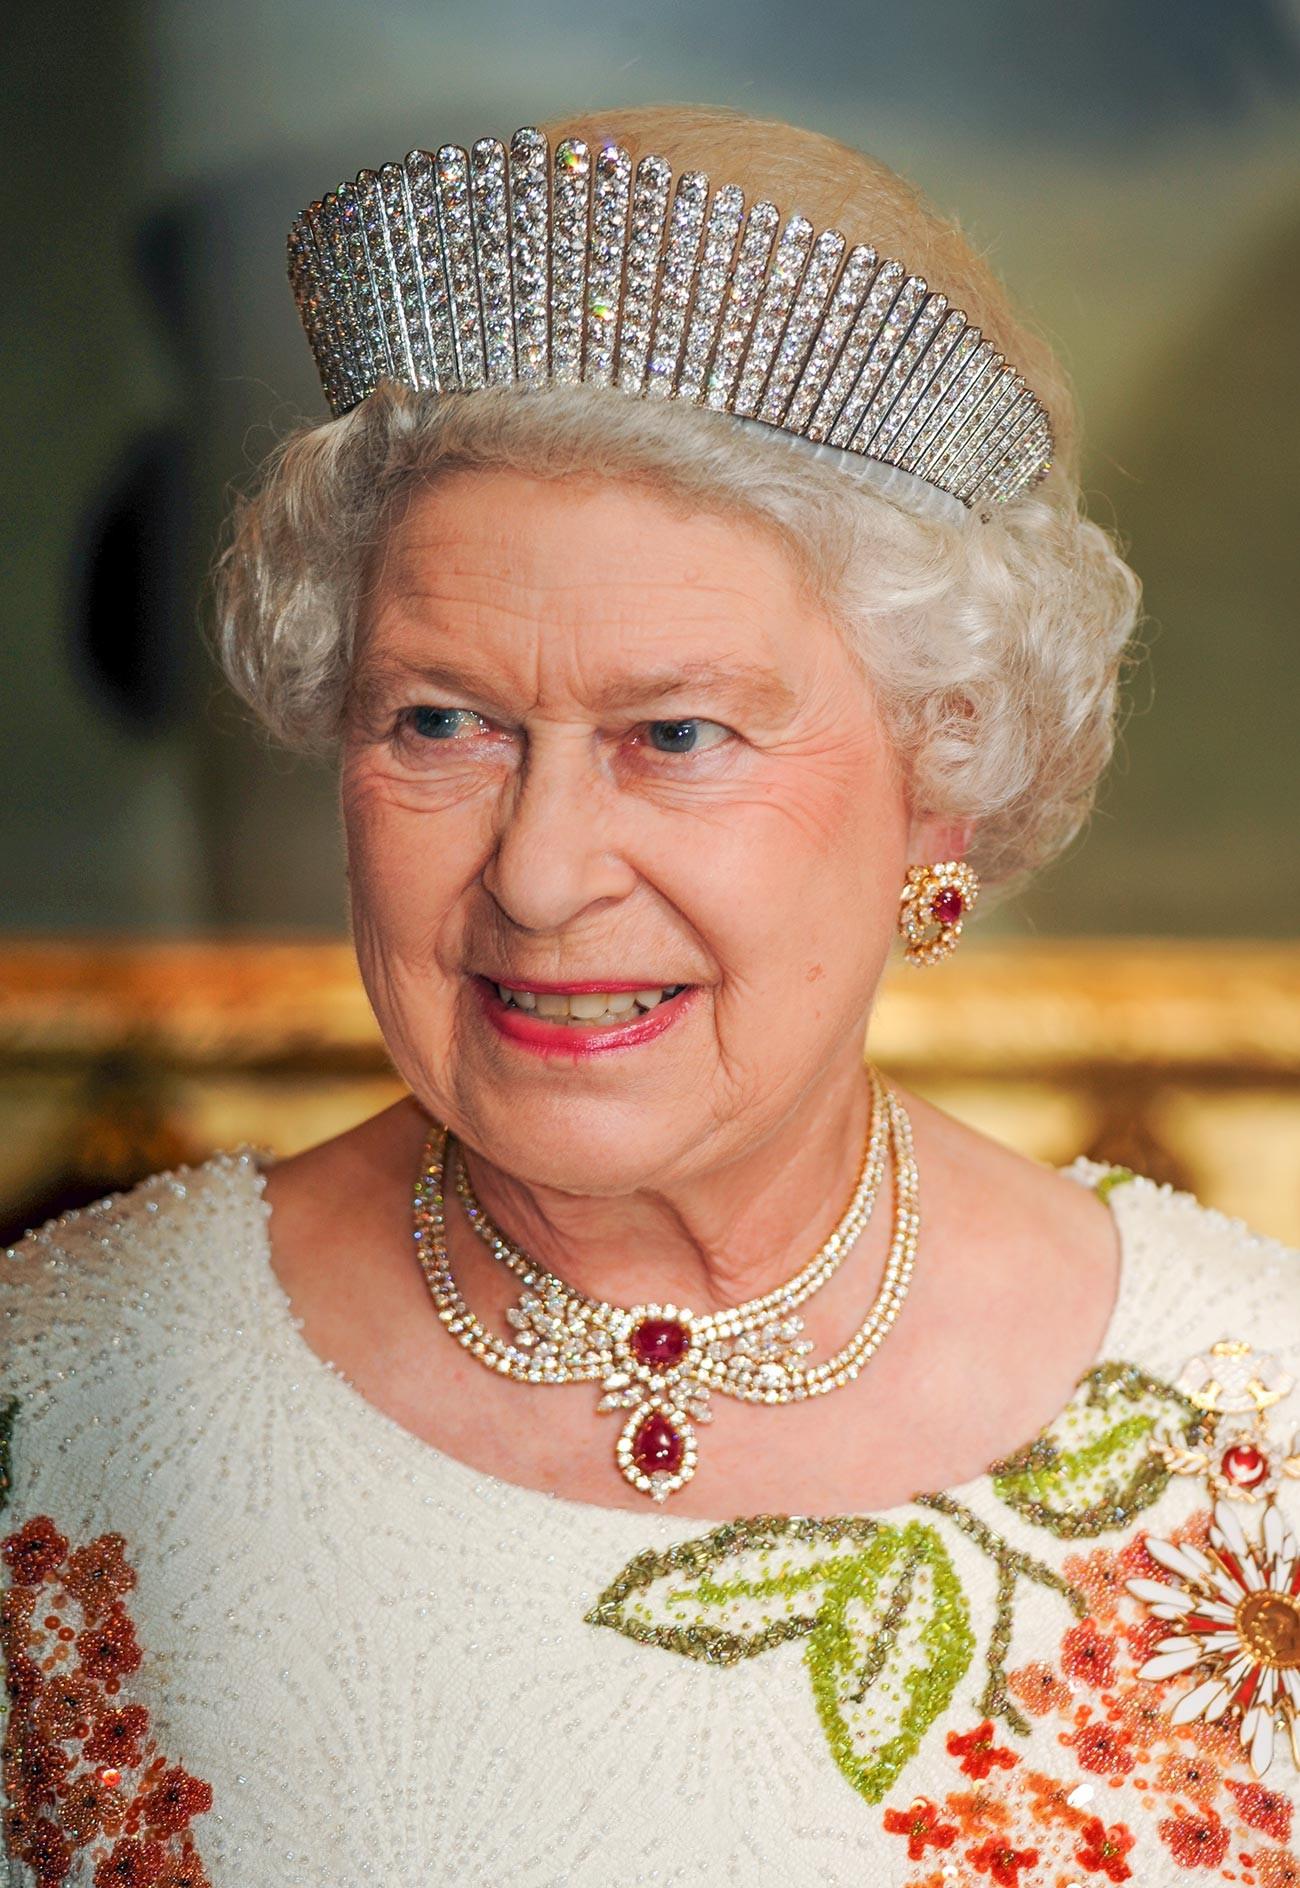 Ratu Elizabeth ii menghadiri Perjamuan Kenegaraan pada hari pertama kunjungan kenegaraan ke Turki pada 13 Mei 2008 di Ankara.